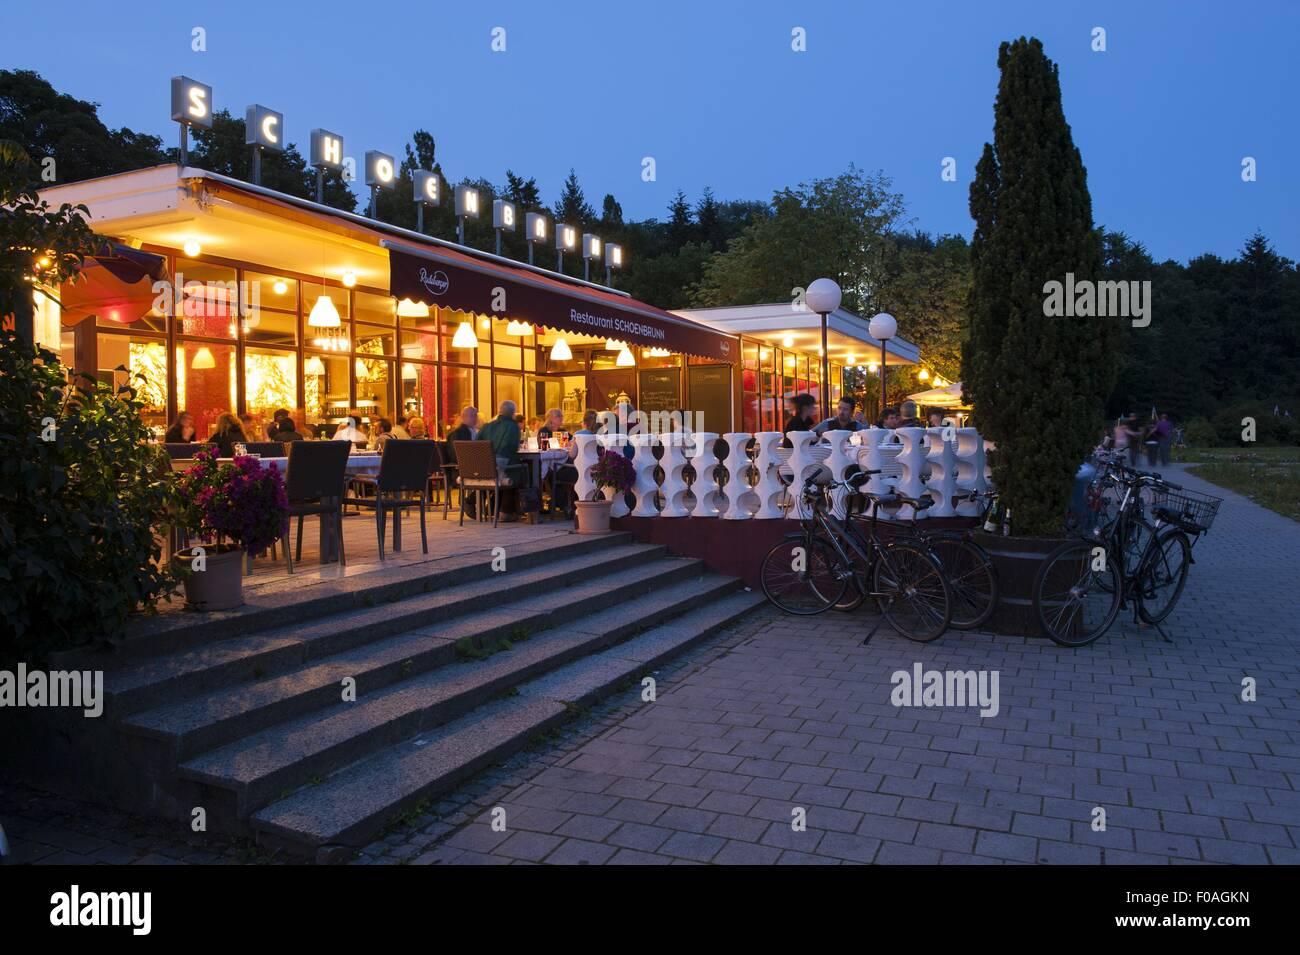 People at restaurant Schonbrunn at night in Volkspark Friedrichshain, Berlin, Germany - Stock Image